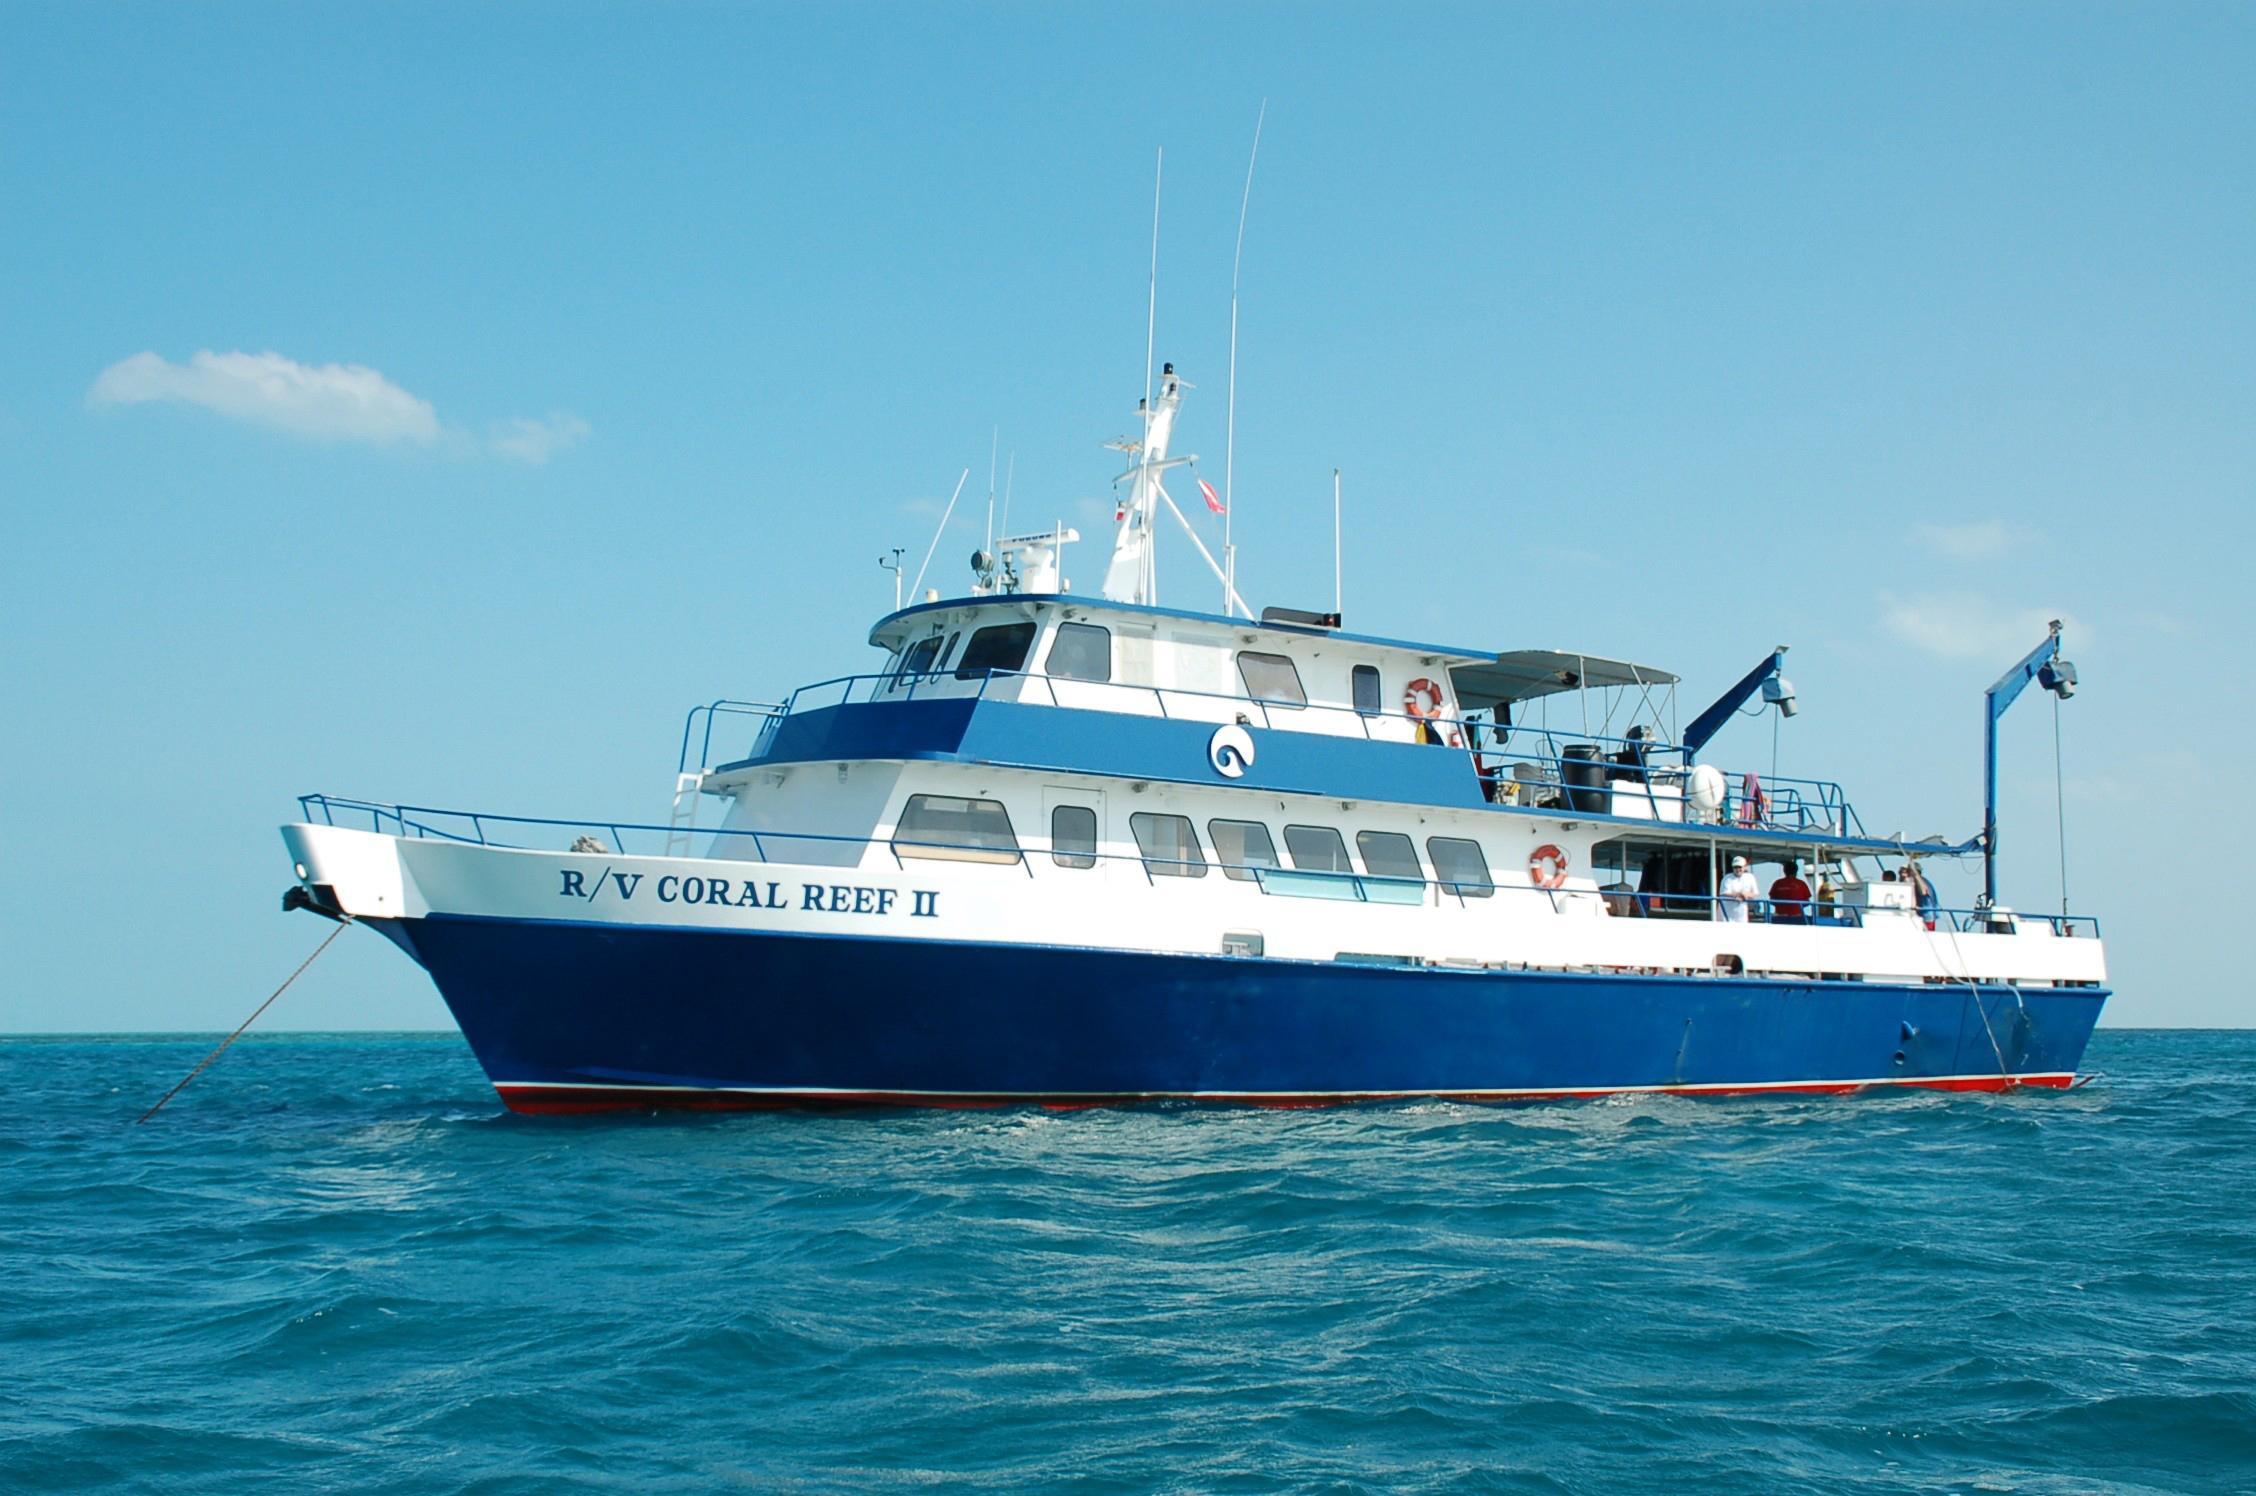 The Shedd Aquarium's Coral Reef II research ship.